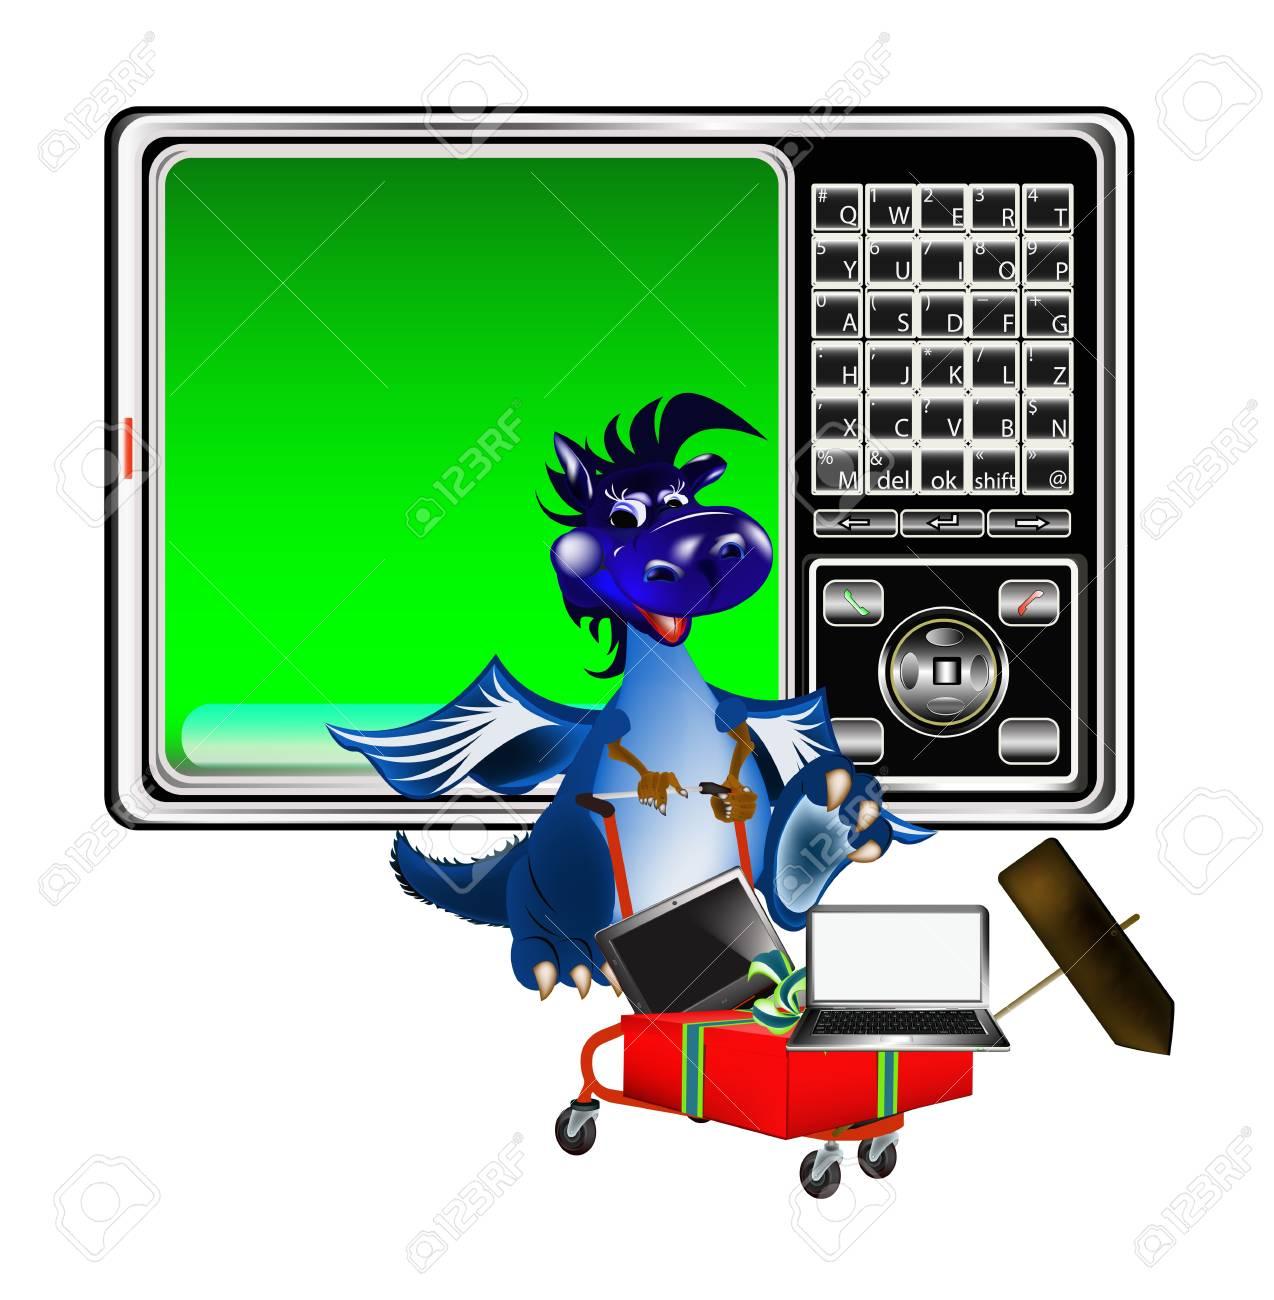 Dark blue dragon a symbol of new 2012 on east calendar Stock Photo - 11070807